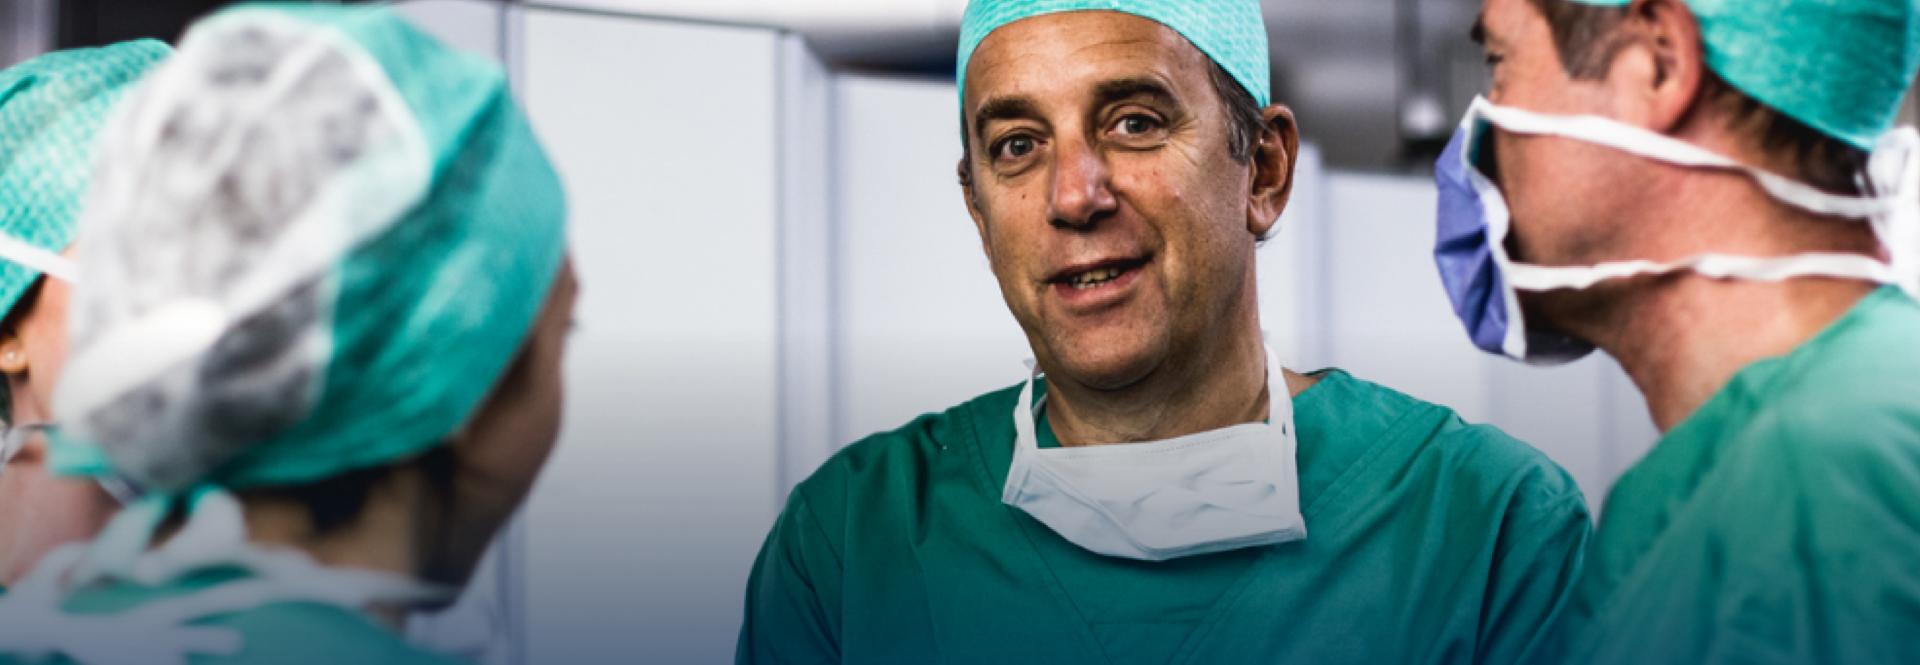 BARIAlink: Dr. Dillemans